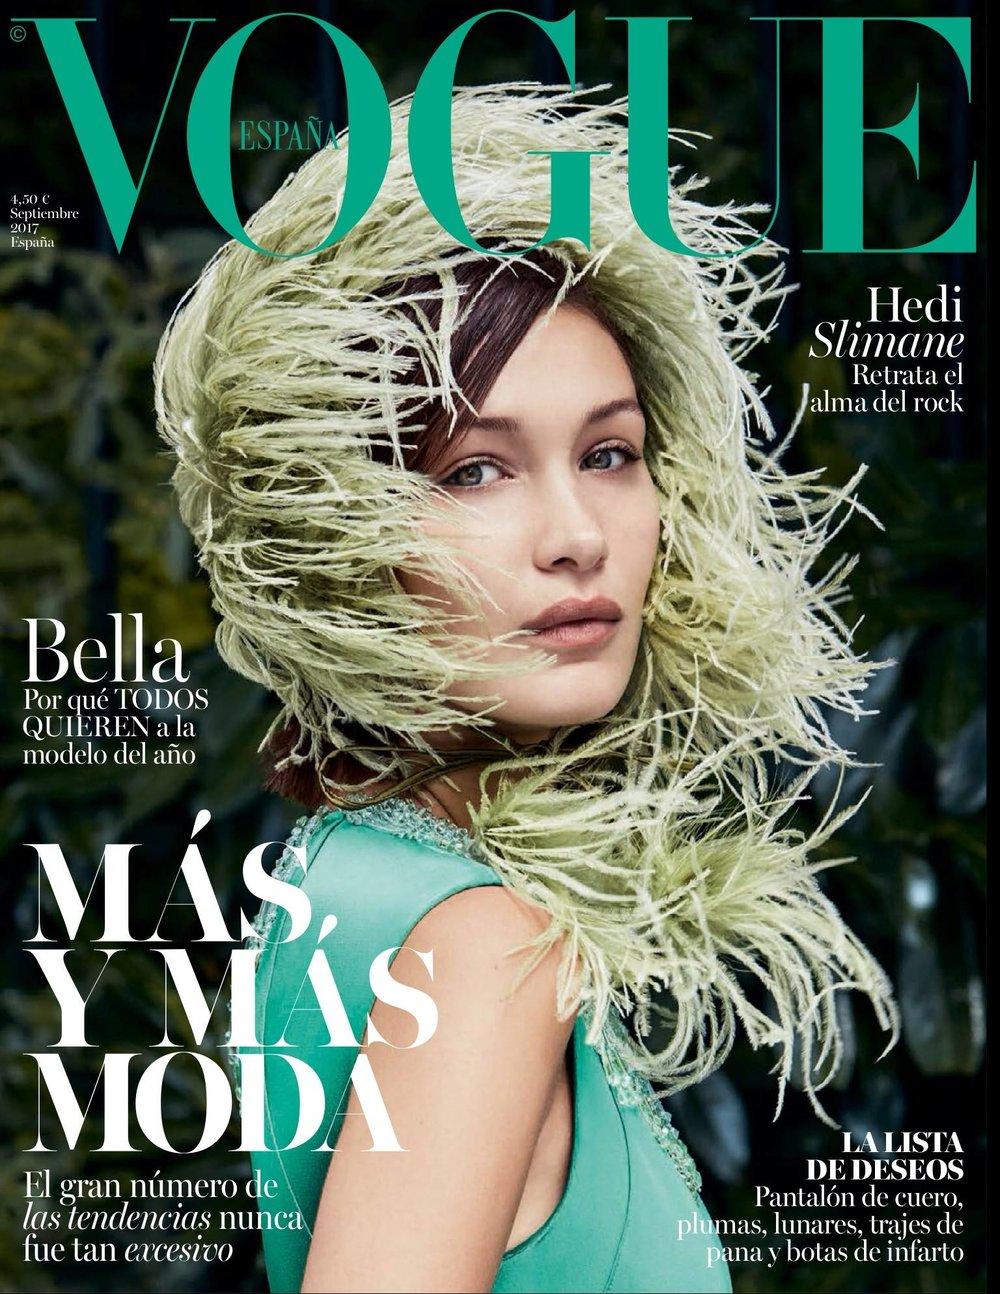 bella-hadid-patrick-demarchelier-vogue-spain-sept-2017- (2).JPG